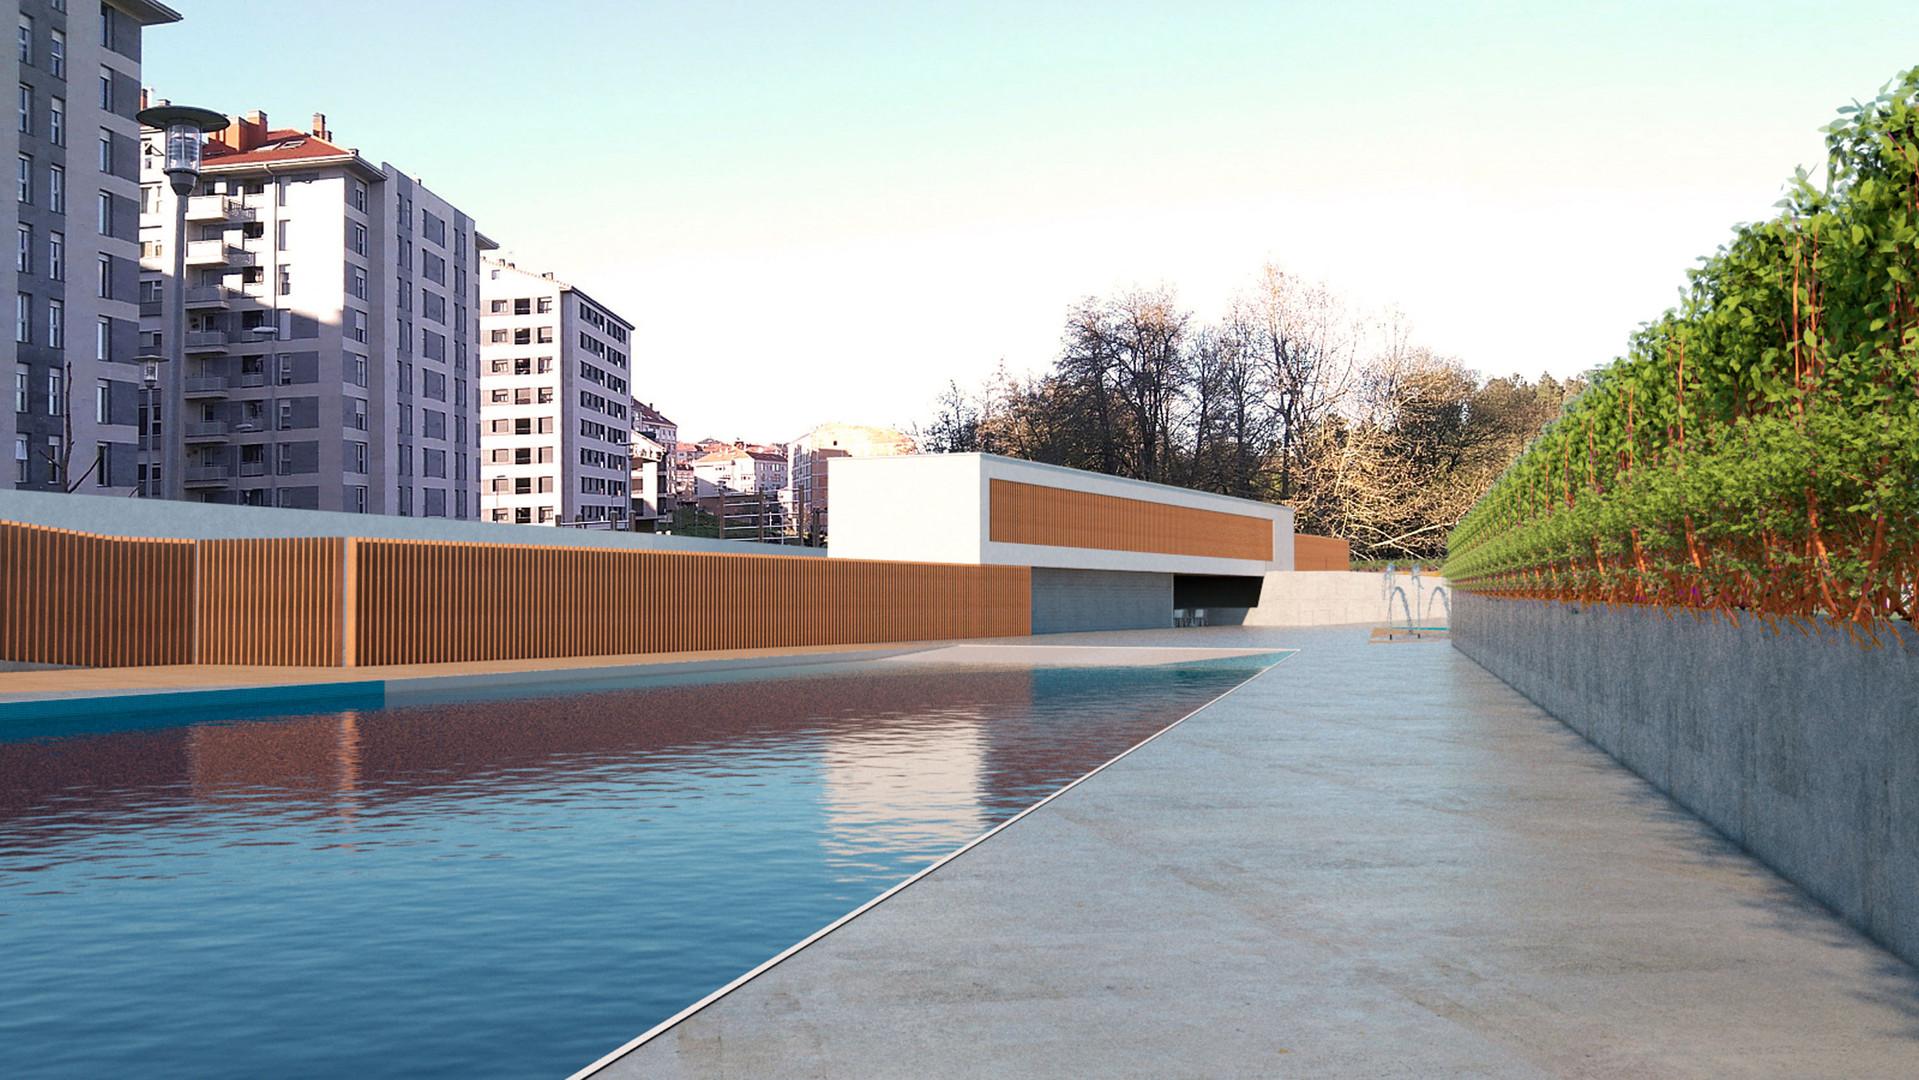 arquitectura-senmais-19.11.02.jpg